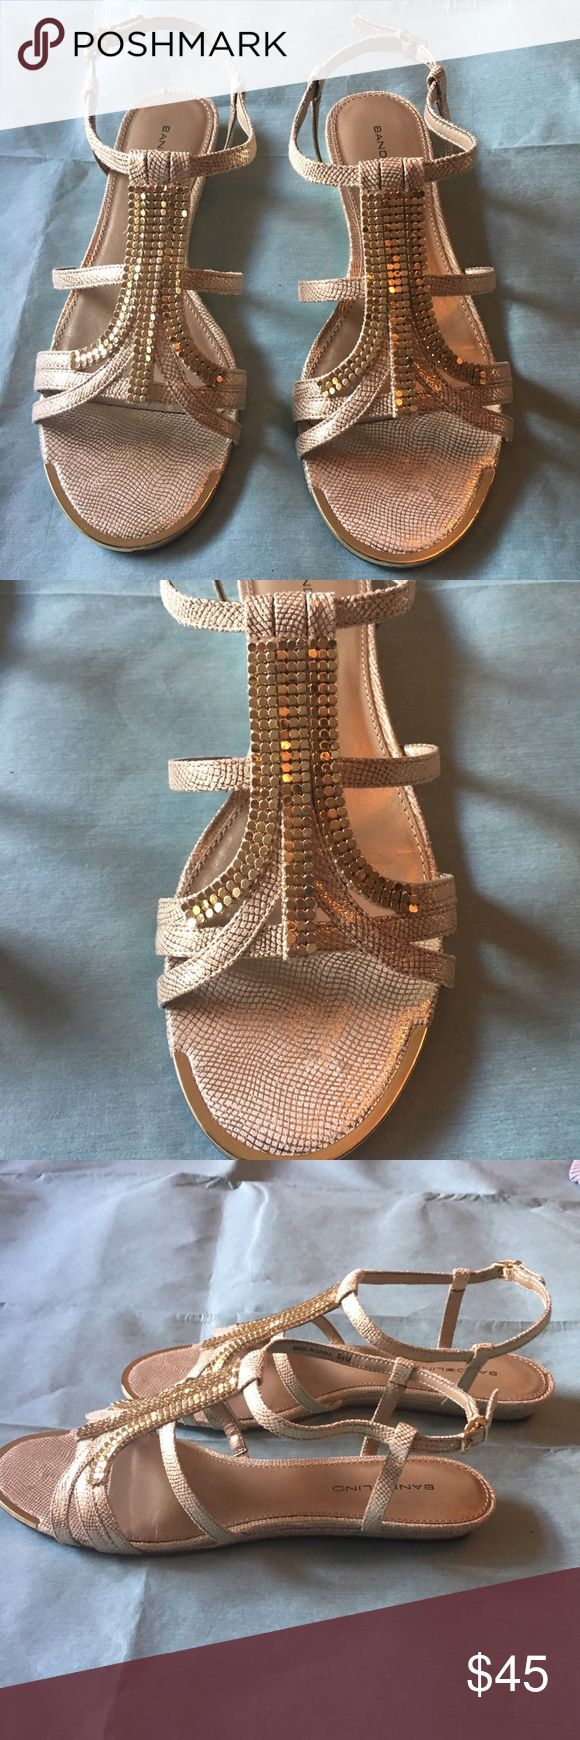 Best 25 Dressy Flat Sandals Ideas On Pinterest Dressy